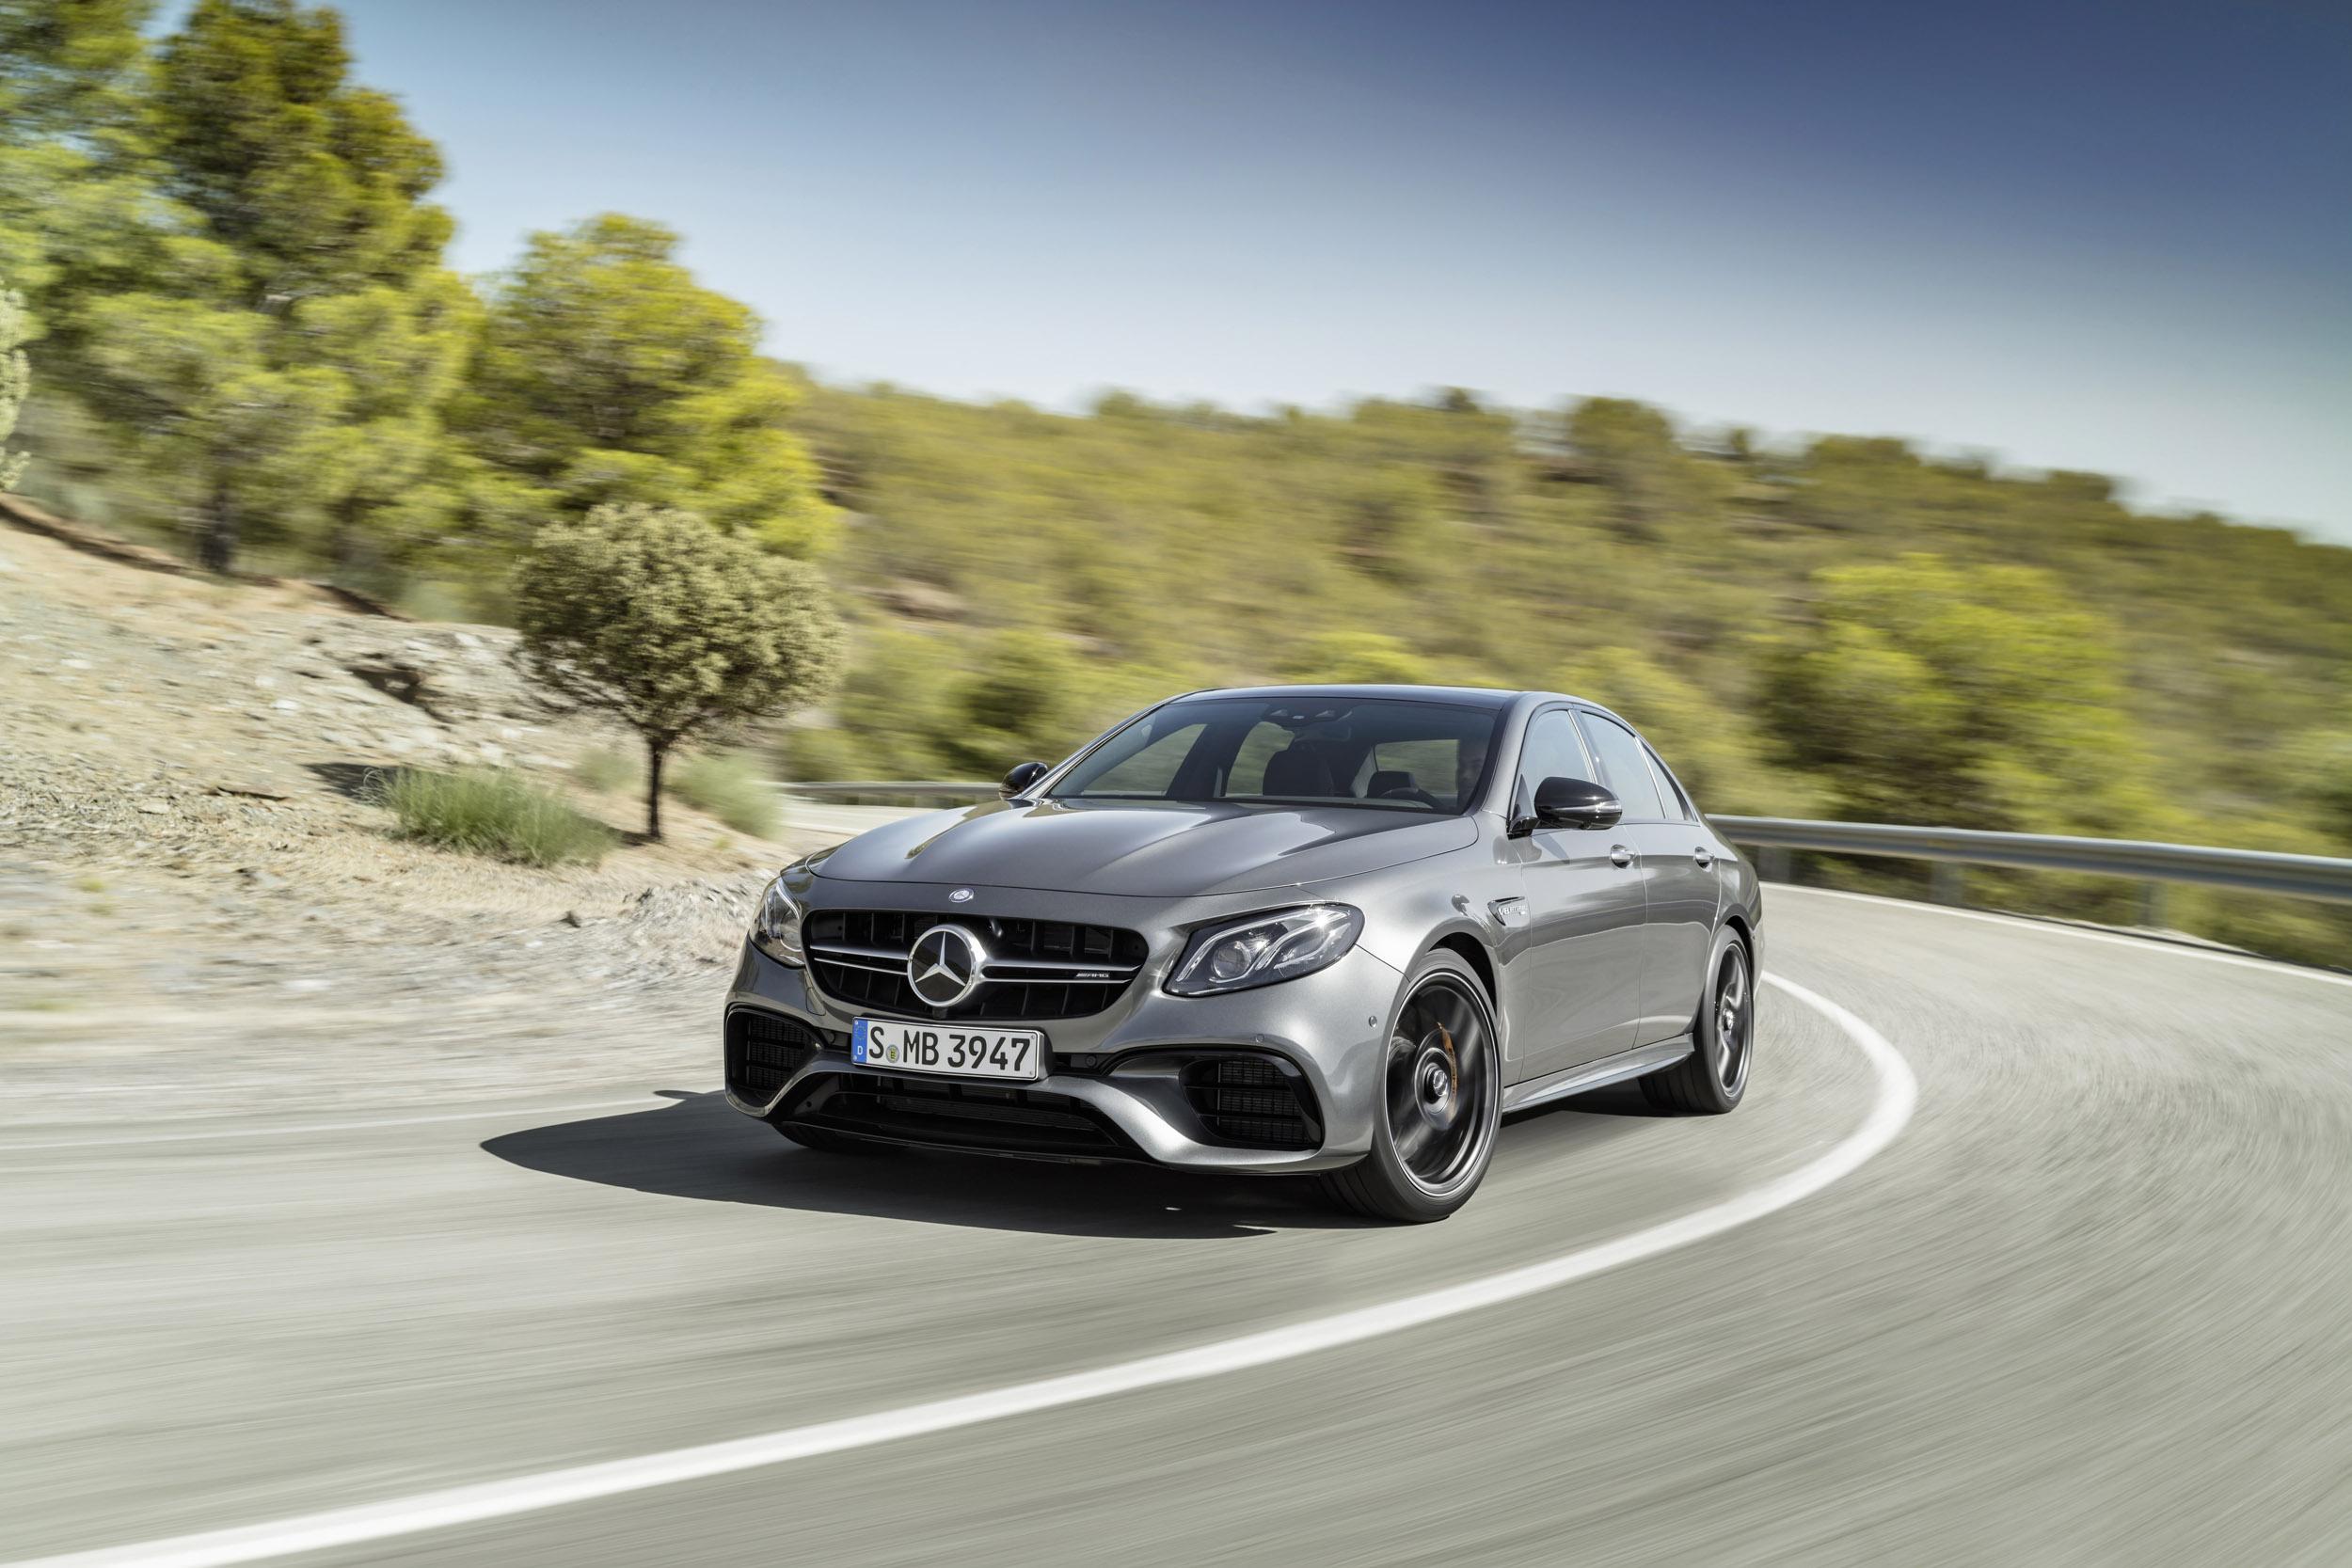 Mercedes E63 Amg >> Mercedes Amg E63 Prices Announced For 603bhp Sledgehammer